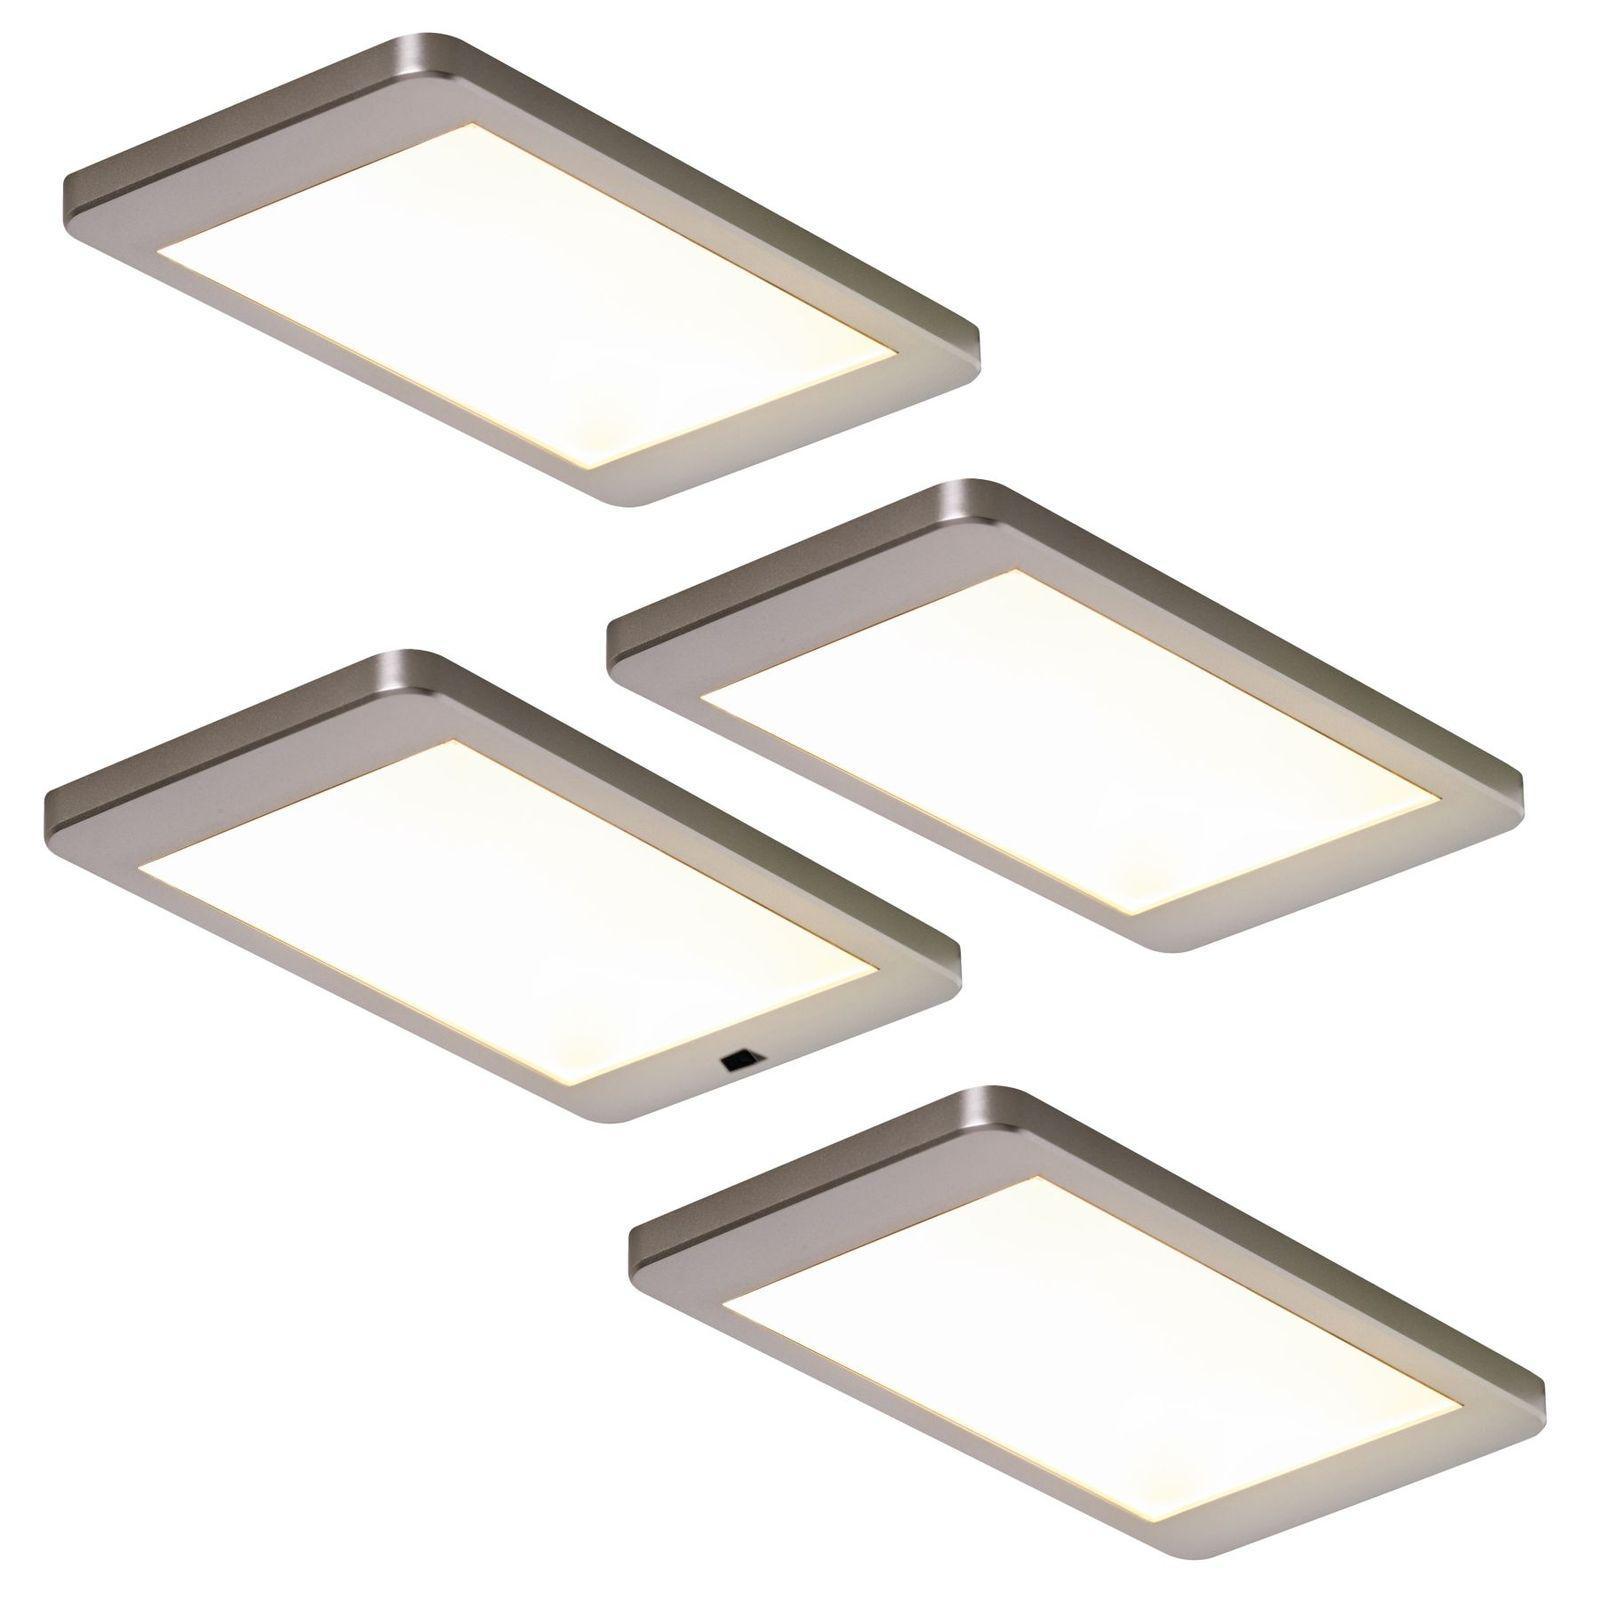 Led Kche Cool Lampe Kche Decke Kchenlampen Online Kaufen